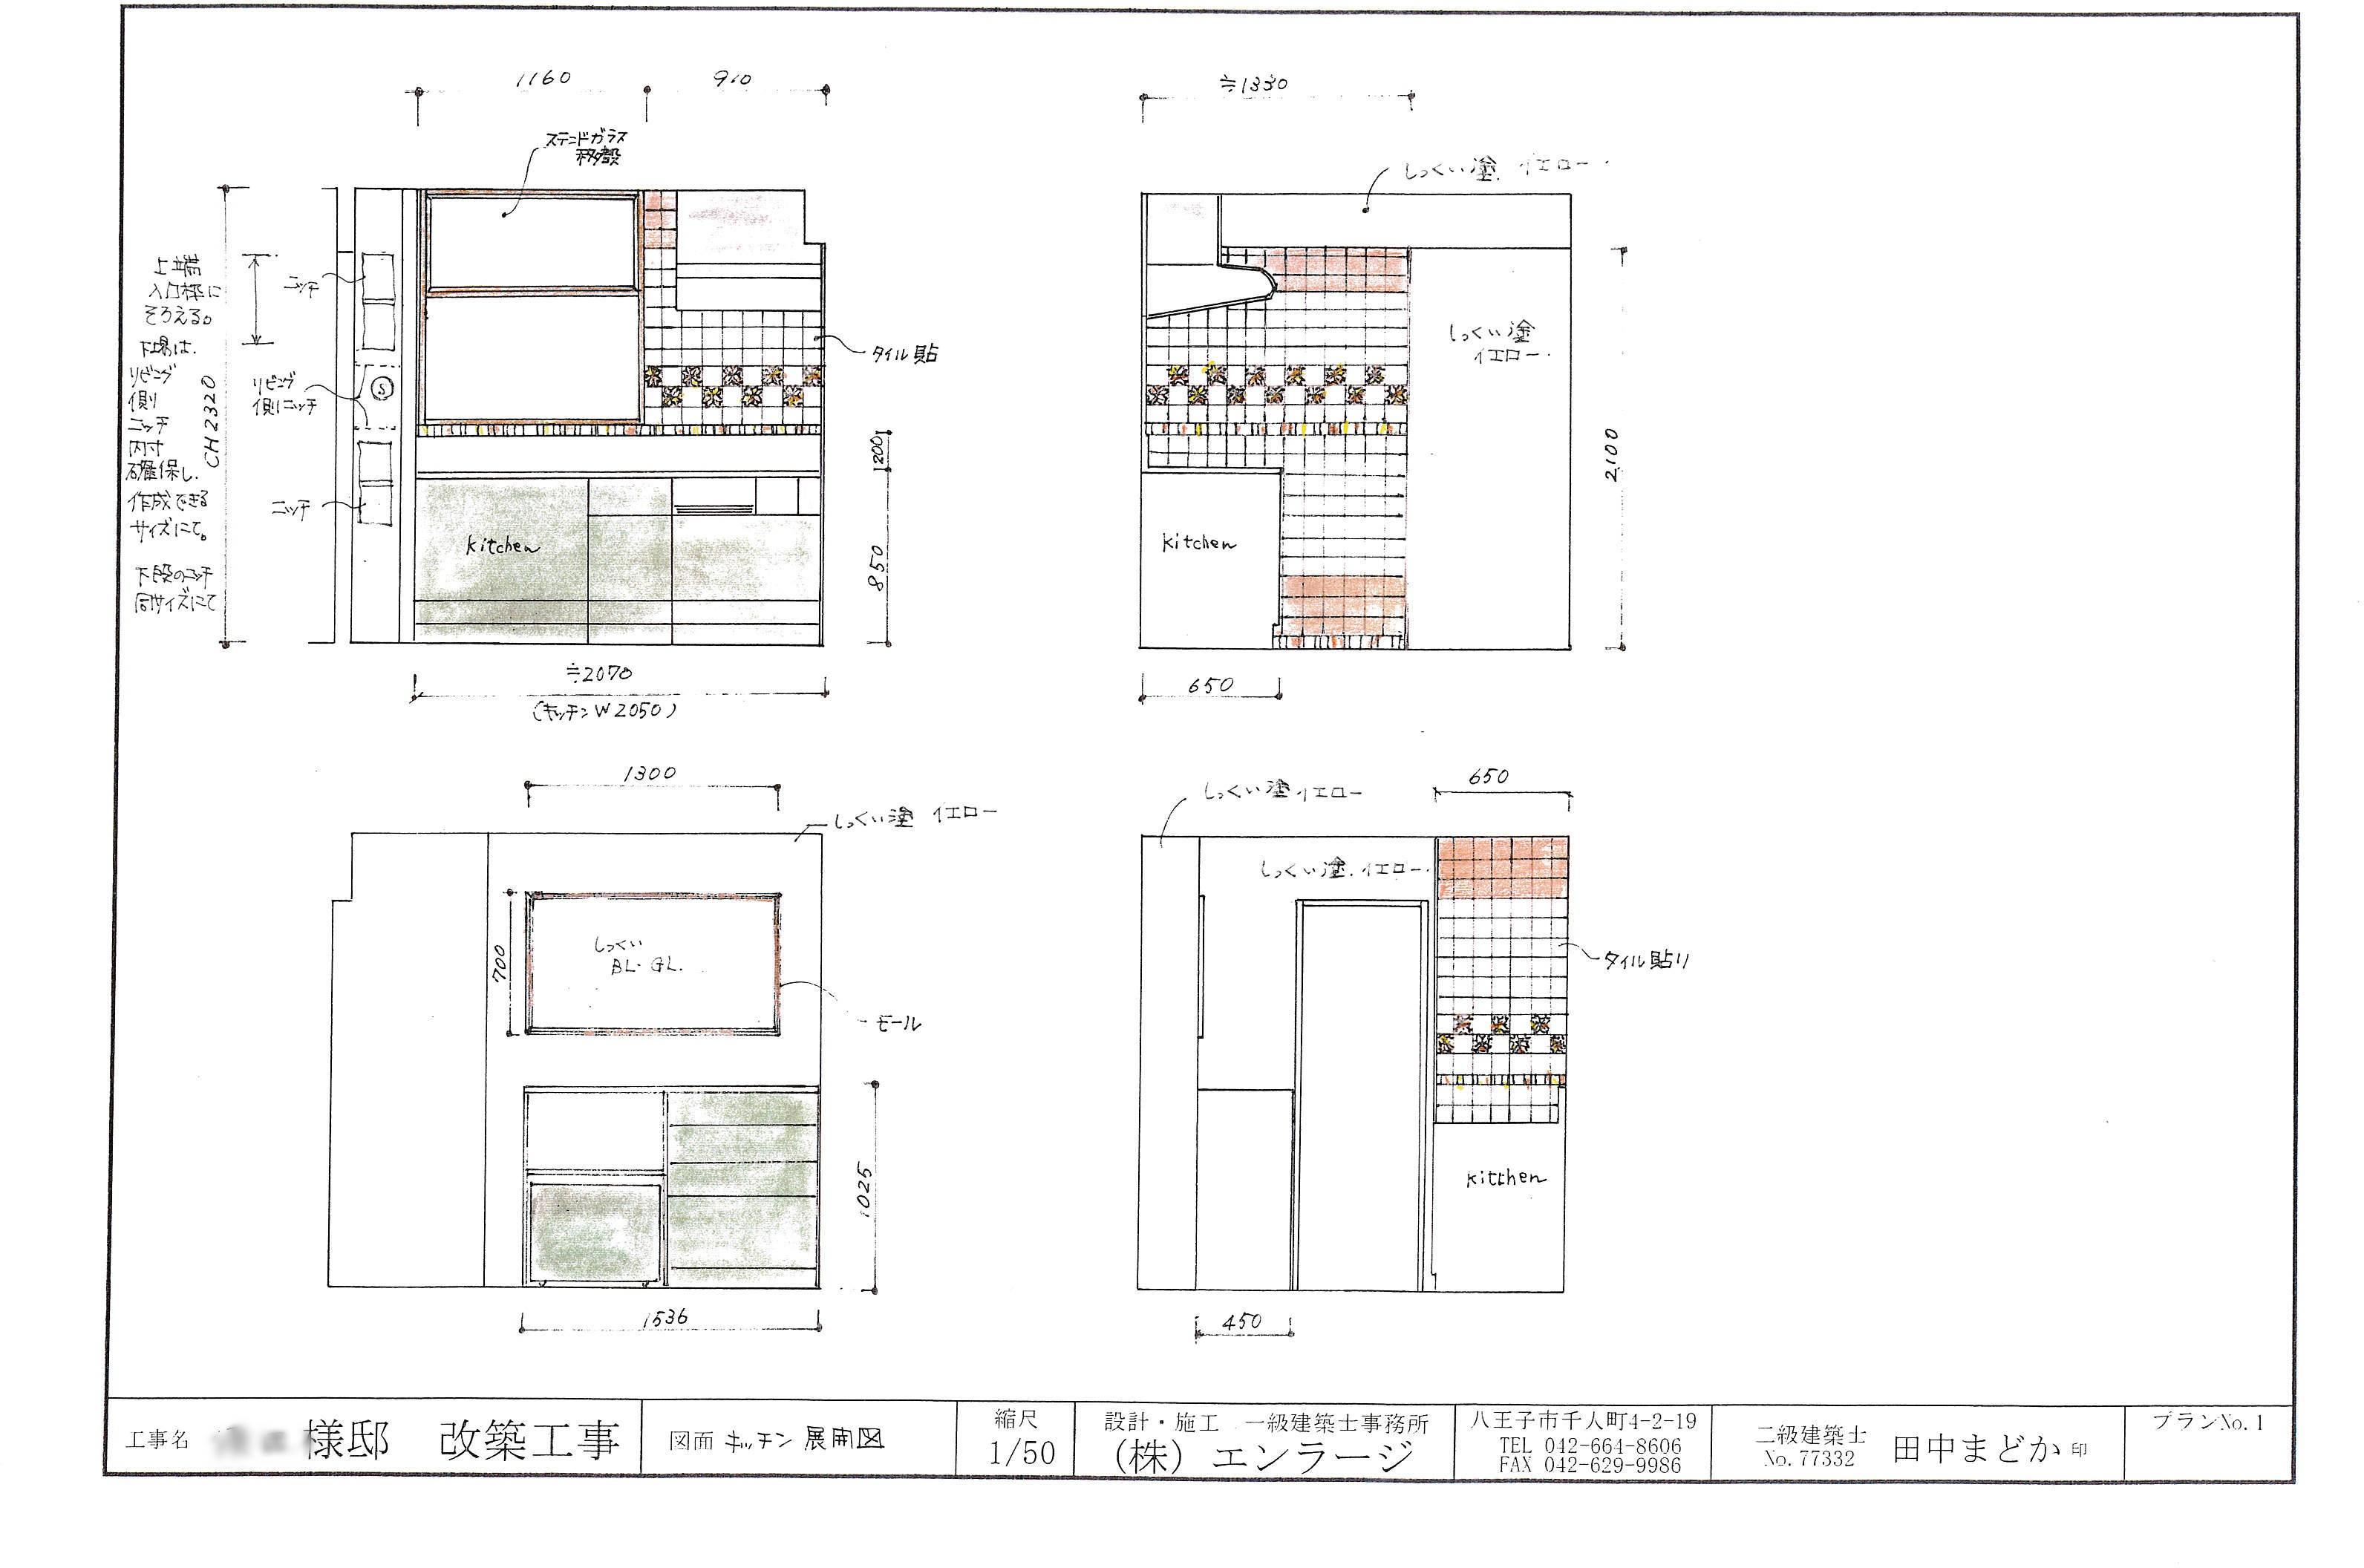 S様邸 キッチンタイル デザイン